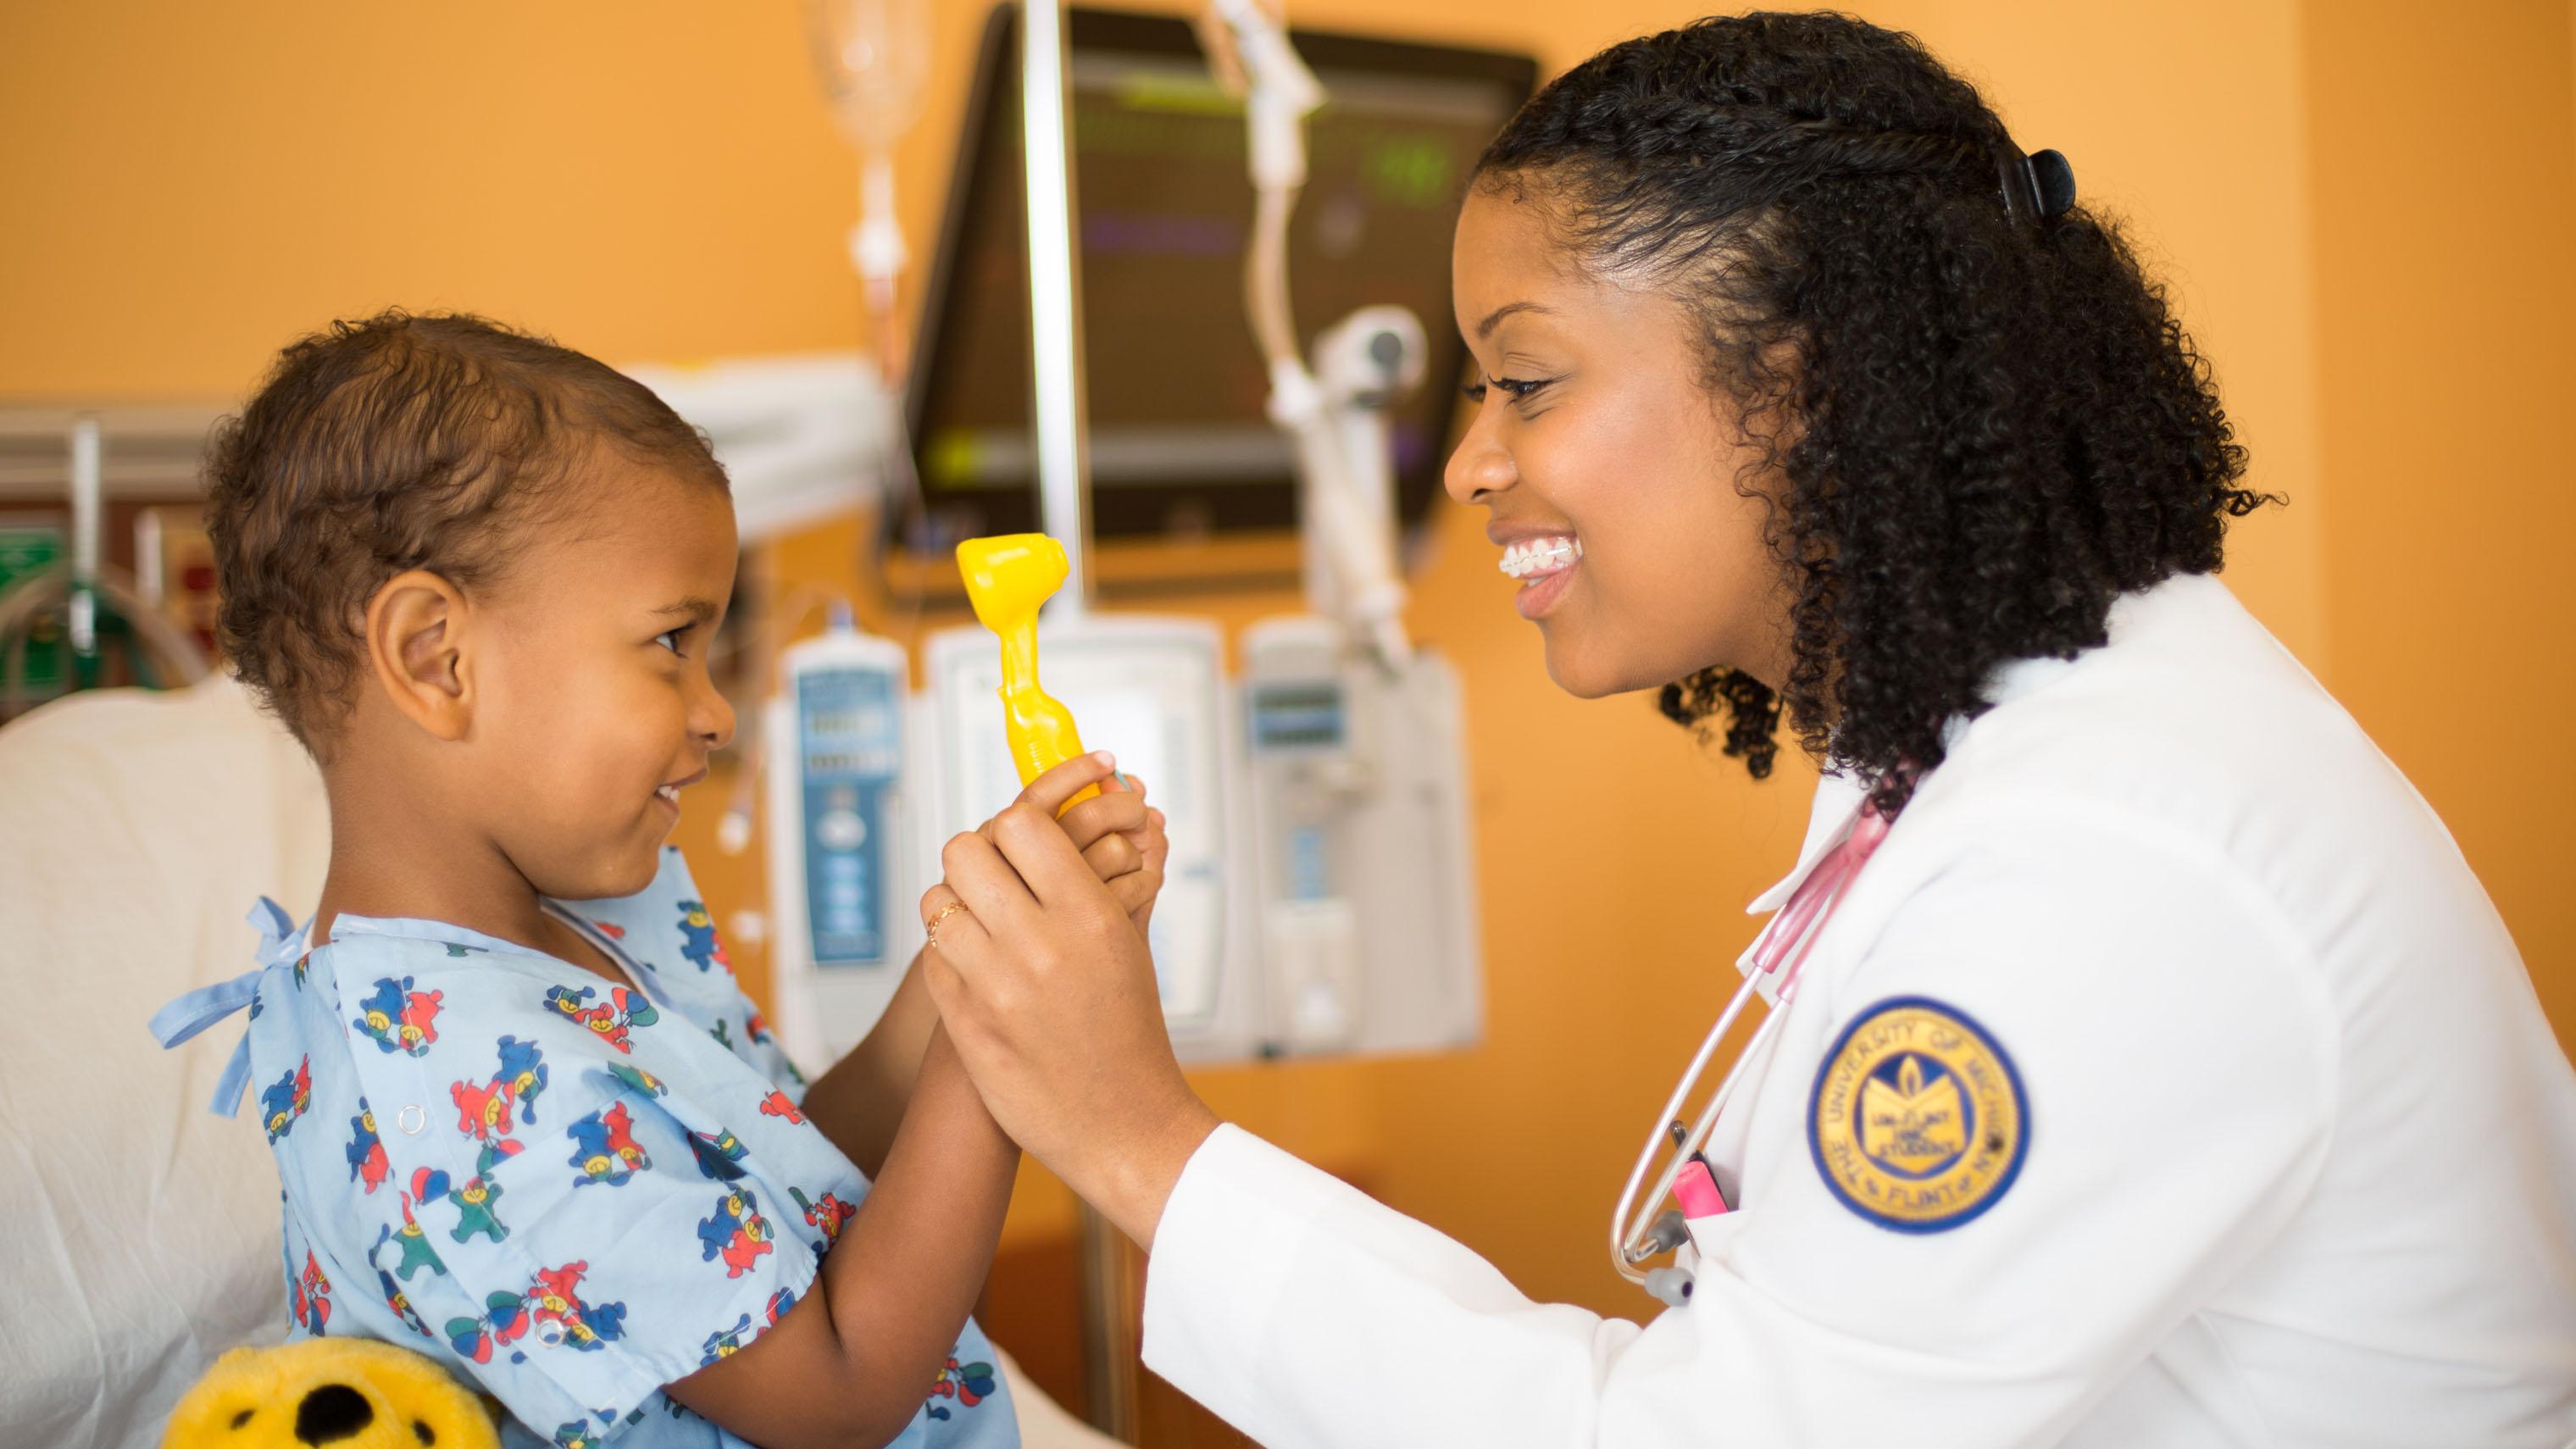 University of Michigan-Flint nursing student treating a pediatric patient